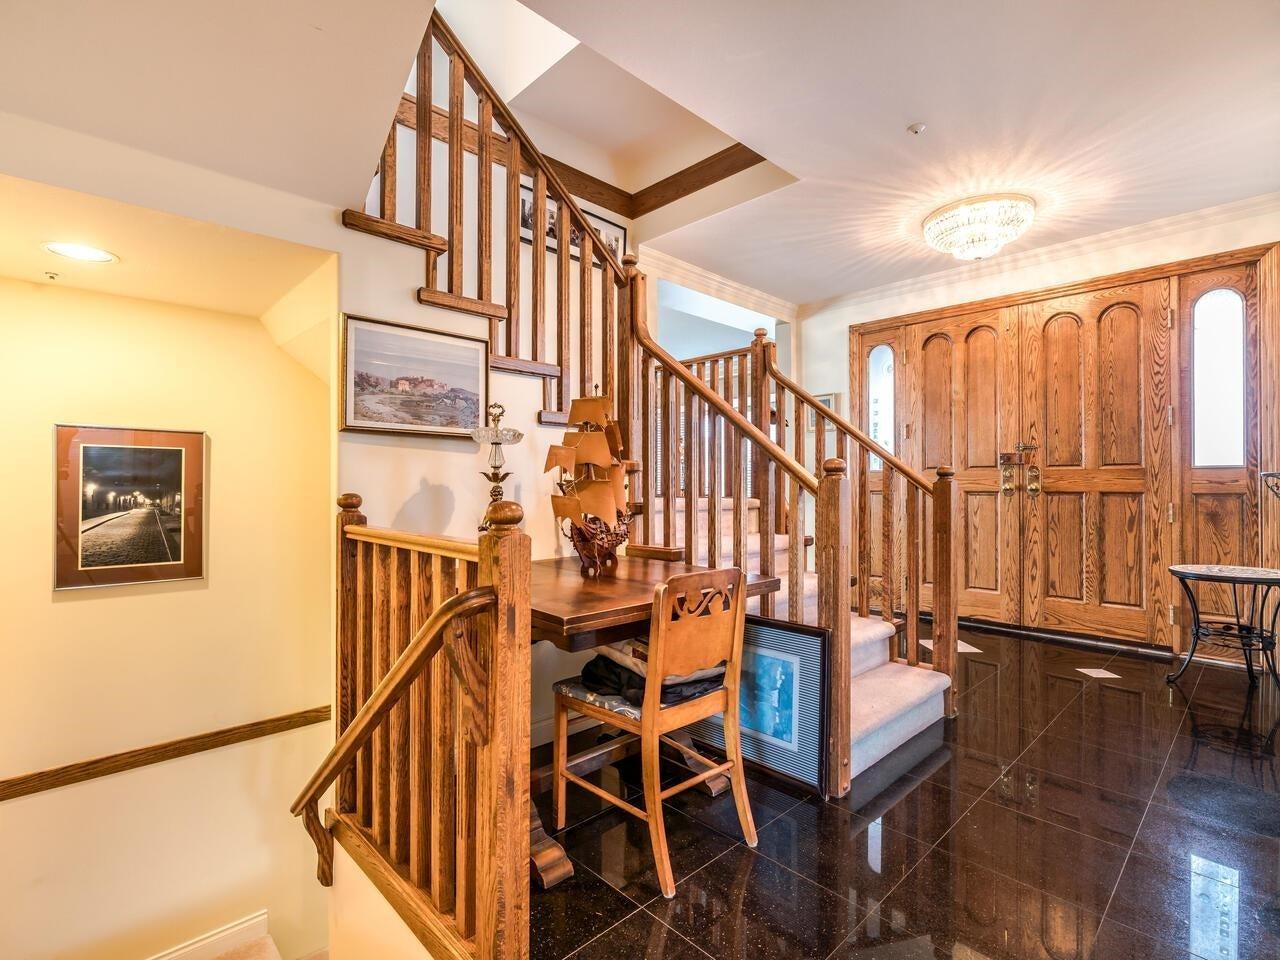 7888 JASPER CRESCENT - Fraserview VE House/Single Family for sale, 7 Bedrooms (R2622945) - #2